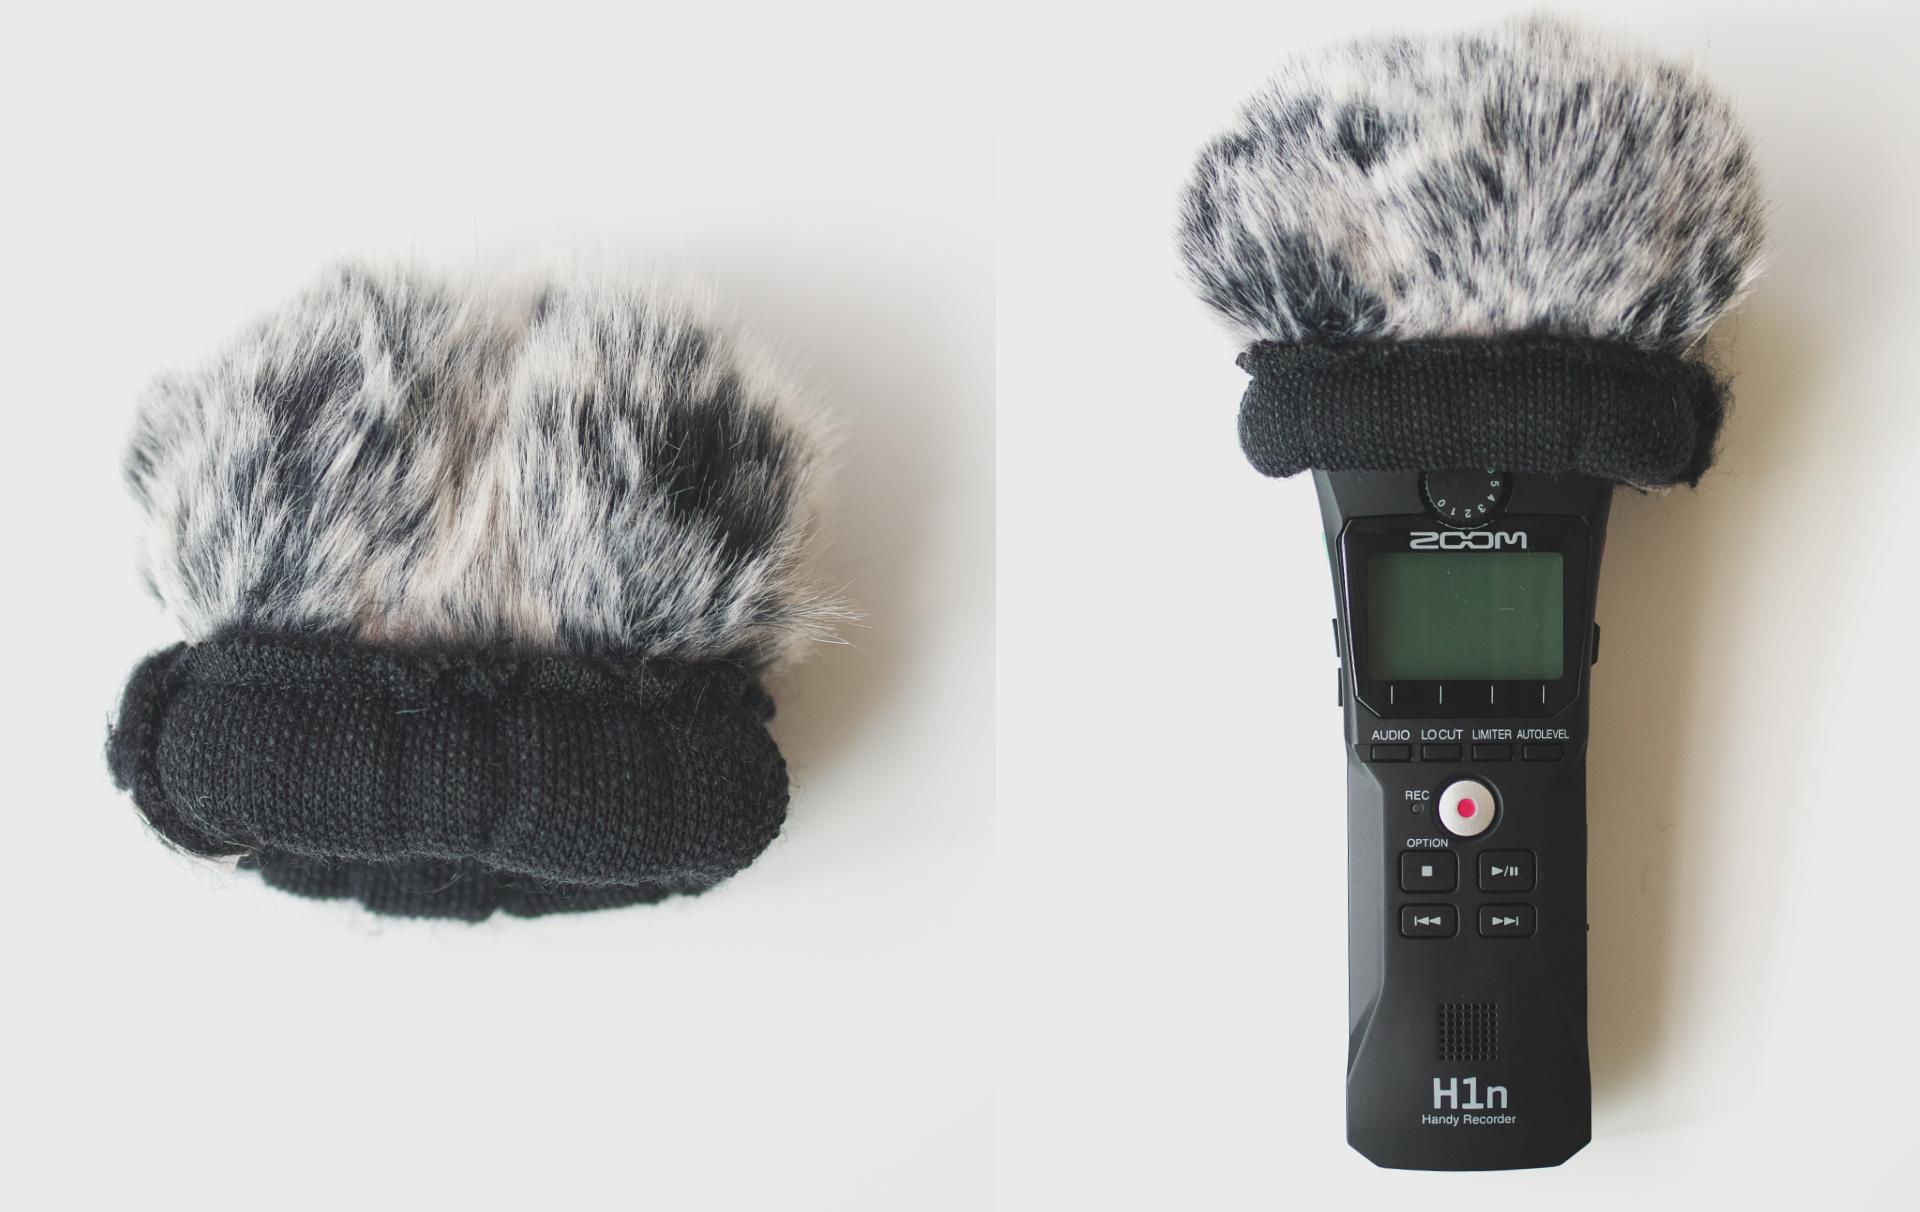 Neewer マイクウインドスクリーン ZOOM H1n ポータブルレコーダー取り付け例2